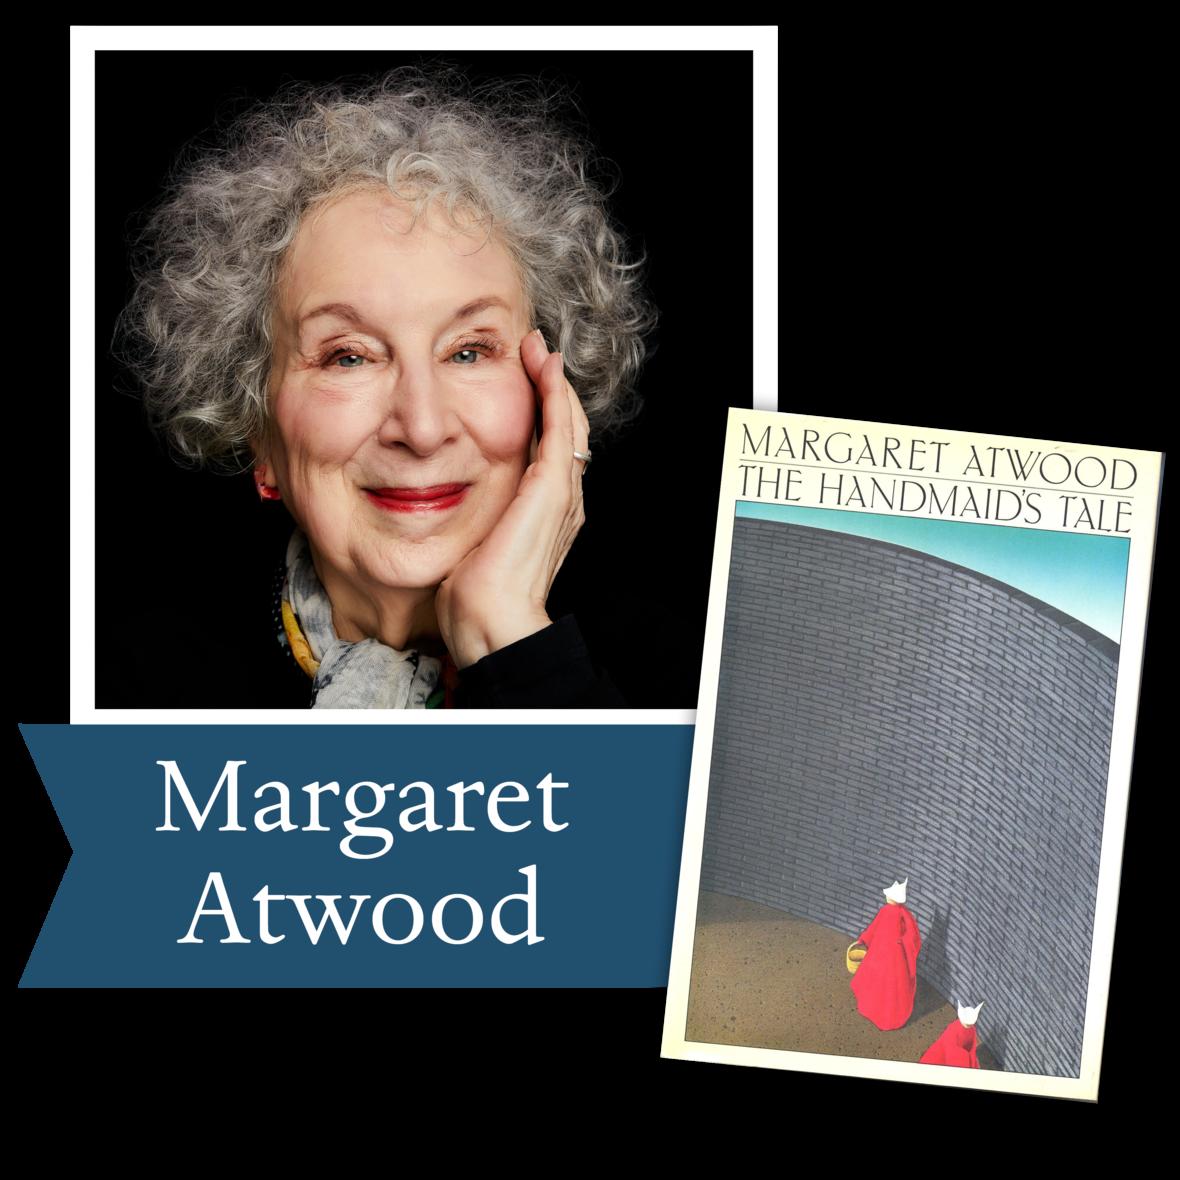 atwood w handmaids tale